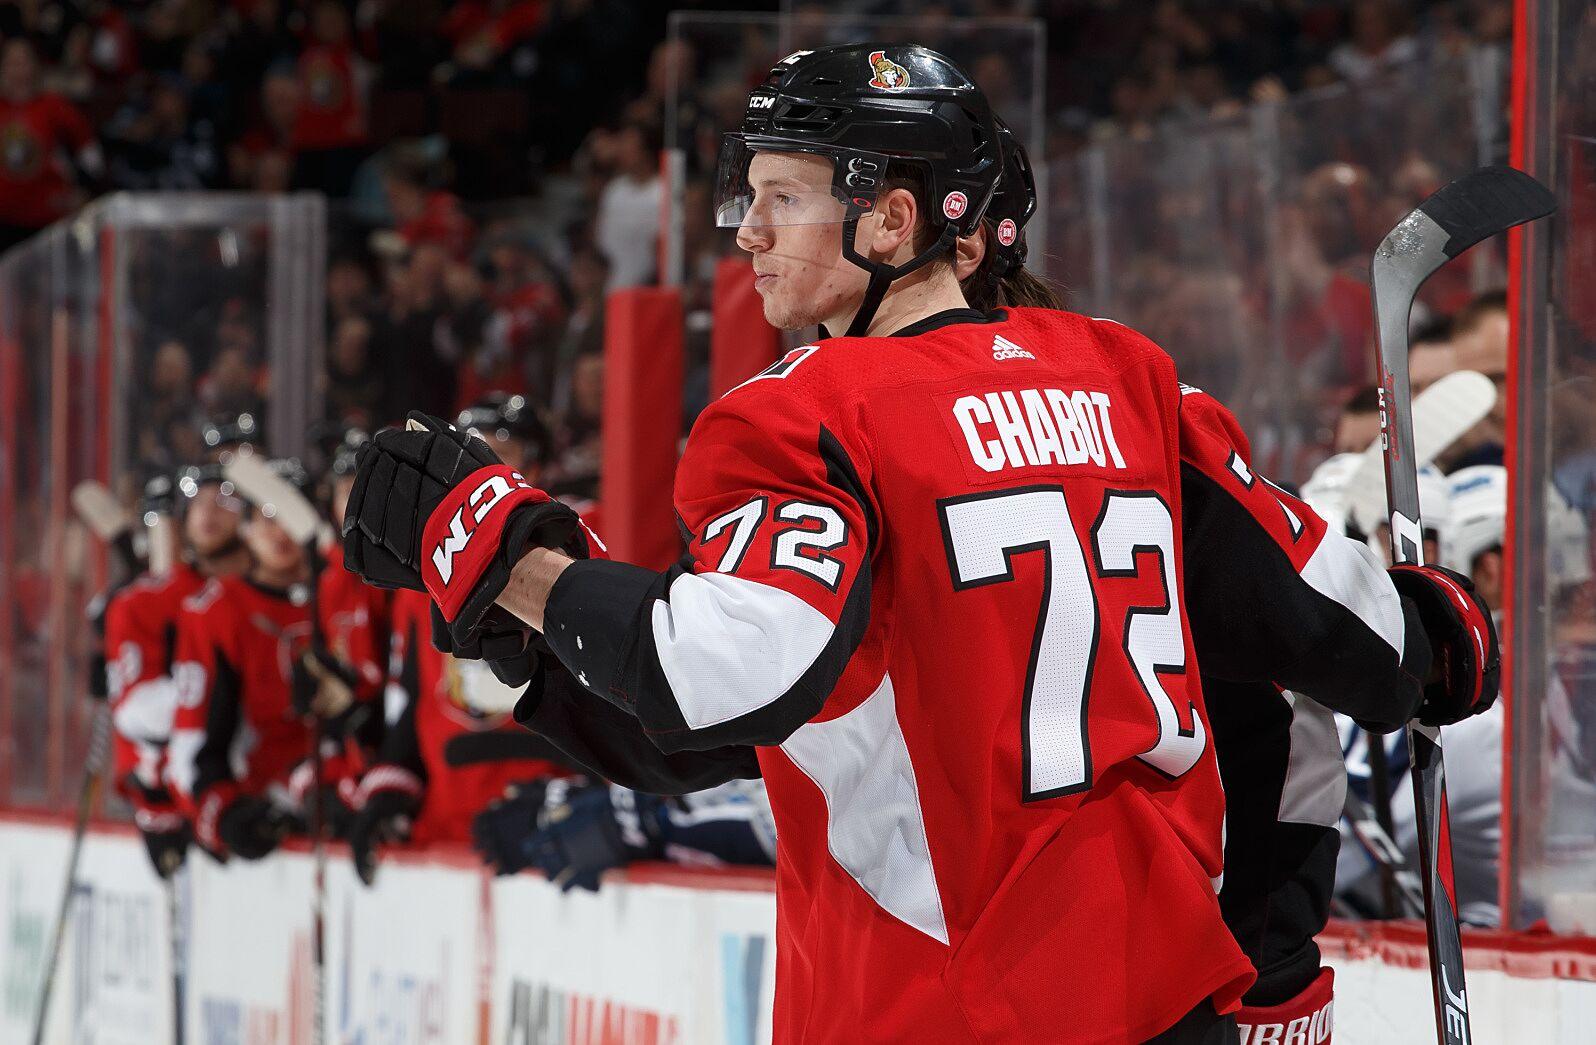 4b58a8e1892 OTTAWA, ON – APRIL 2: Thomas Chabot #72 of the Ottawa Senators celebrates  his third period goal against the Winnipeg Jets at Canadian Tire Centre on  April 2 ...